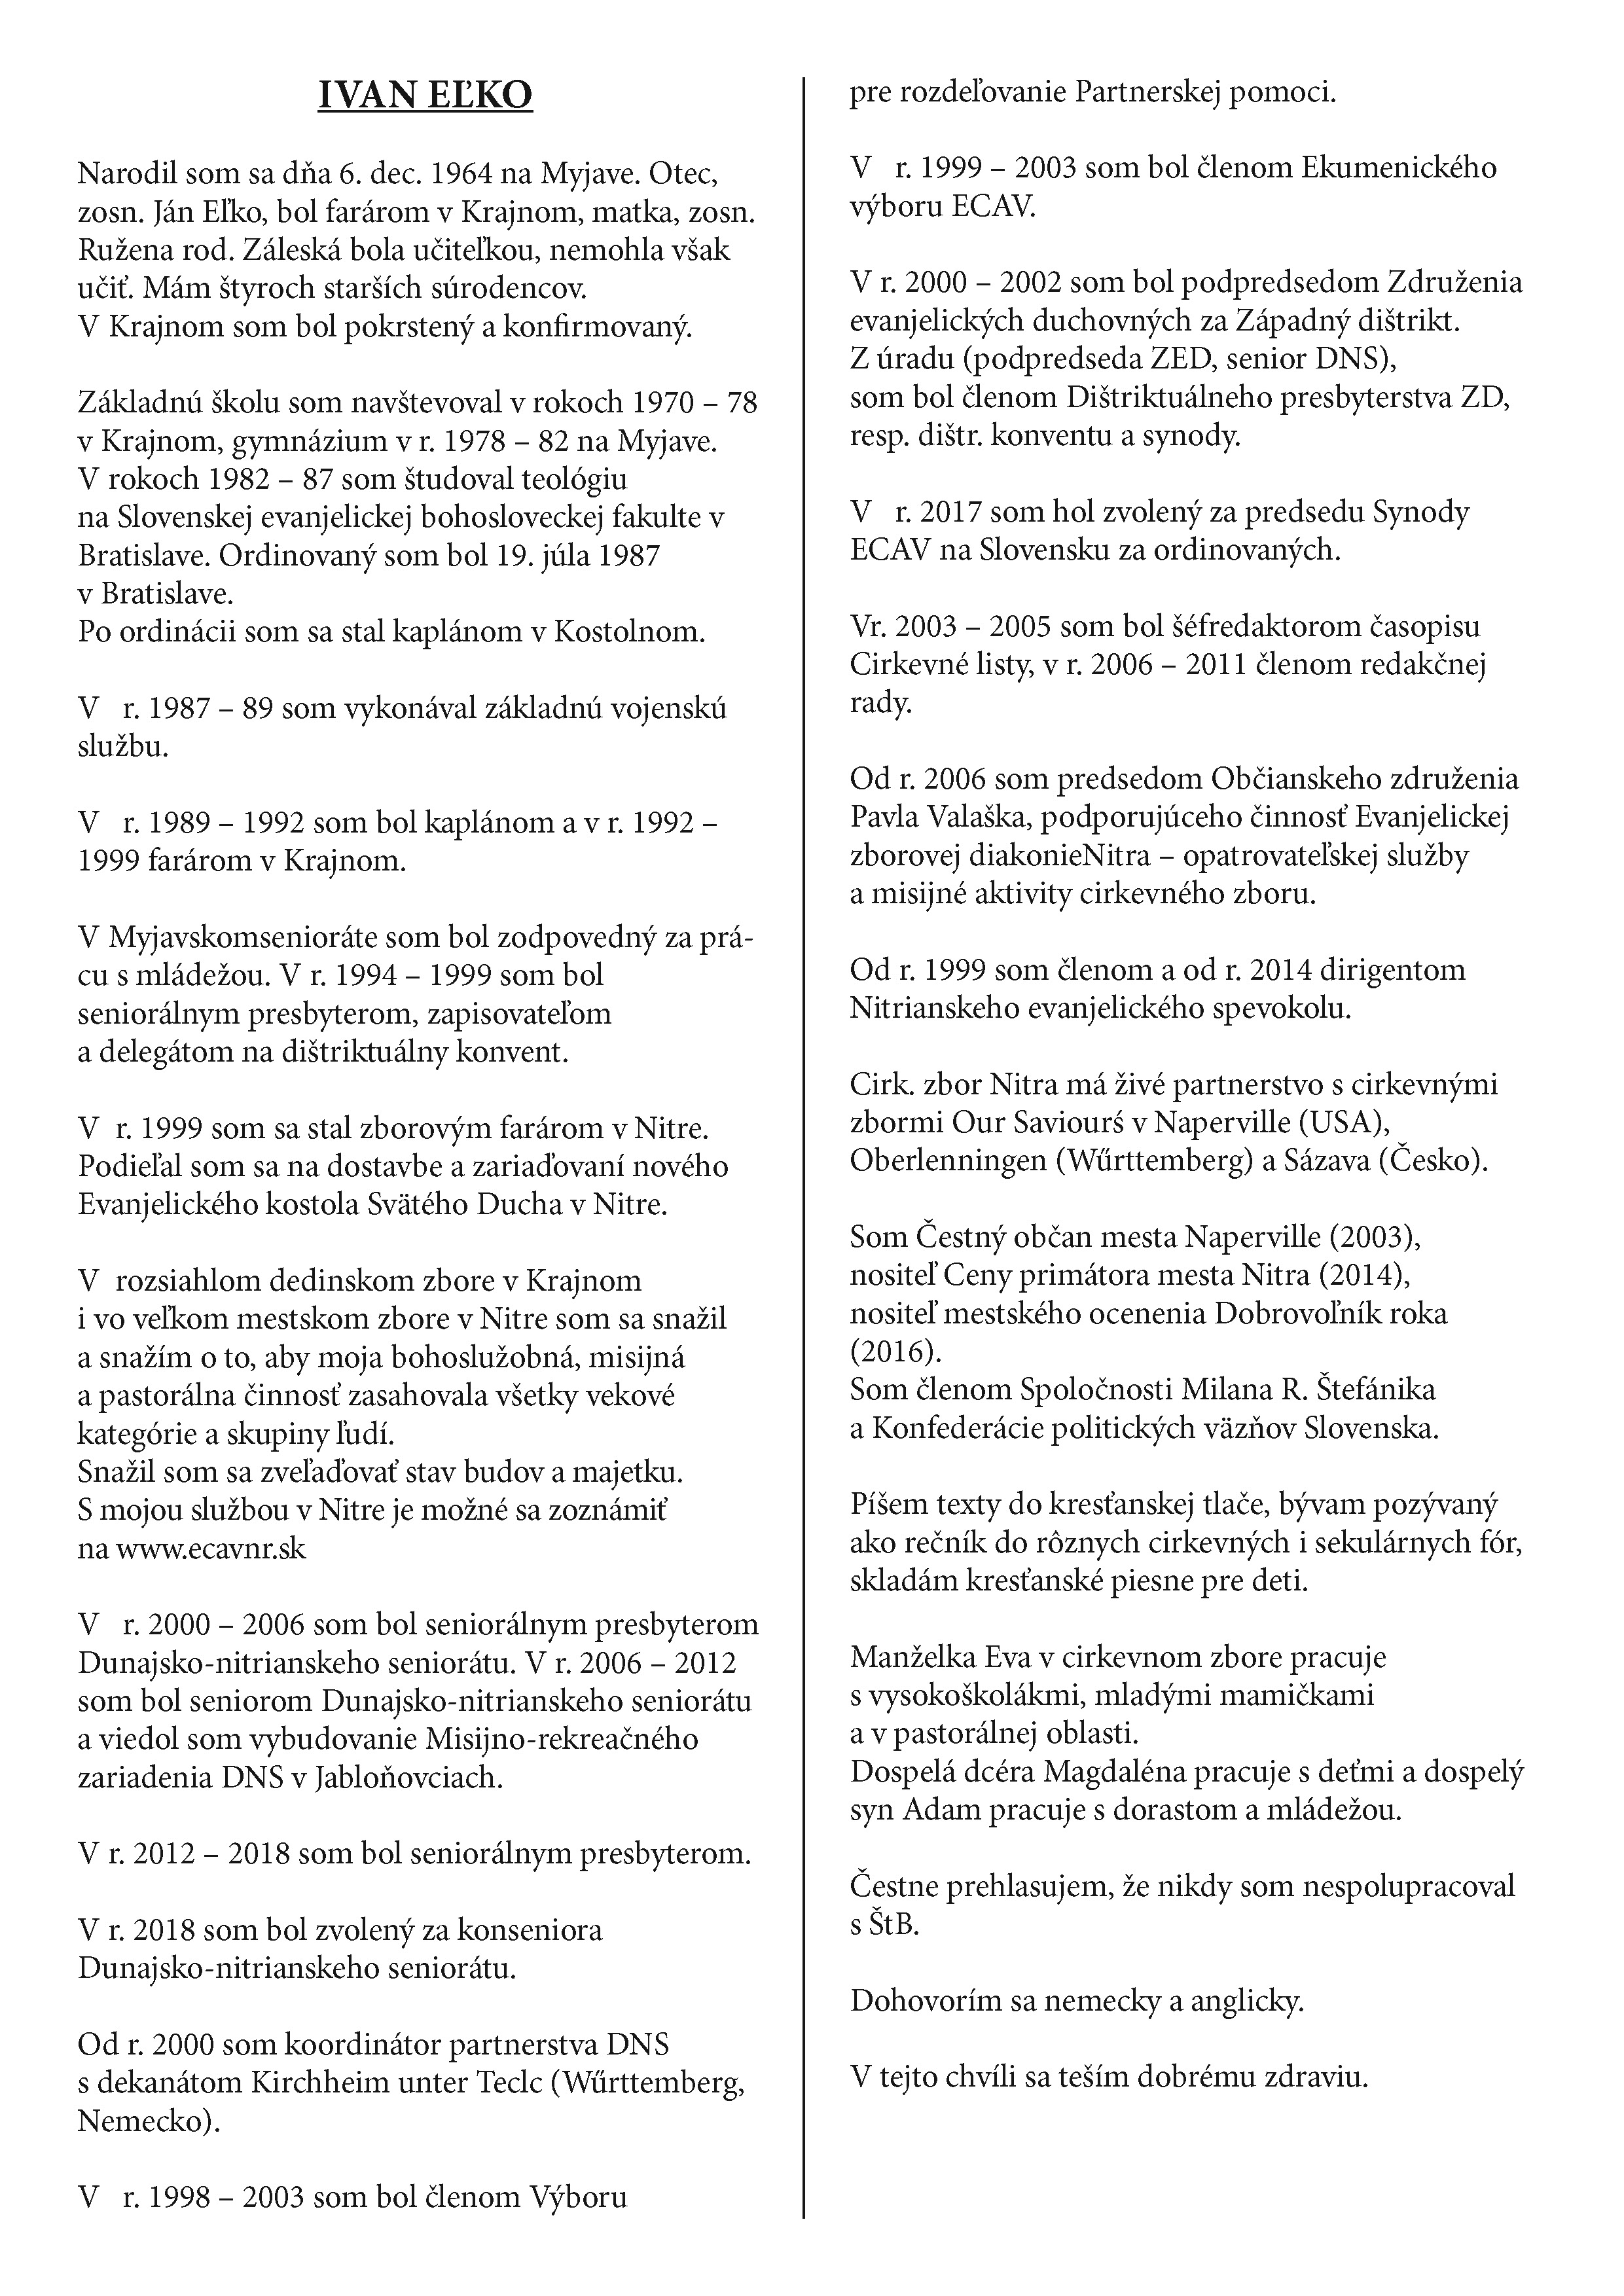 Zivotopisy Biskupov Eľko Kanuch 2018 Page 1 Povazska Bystrica